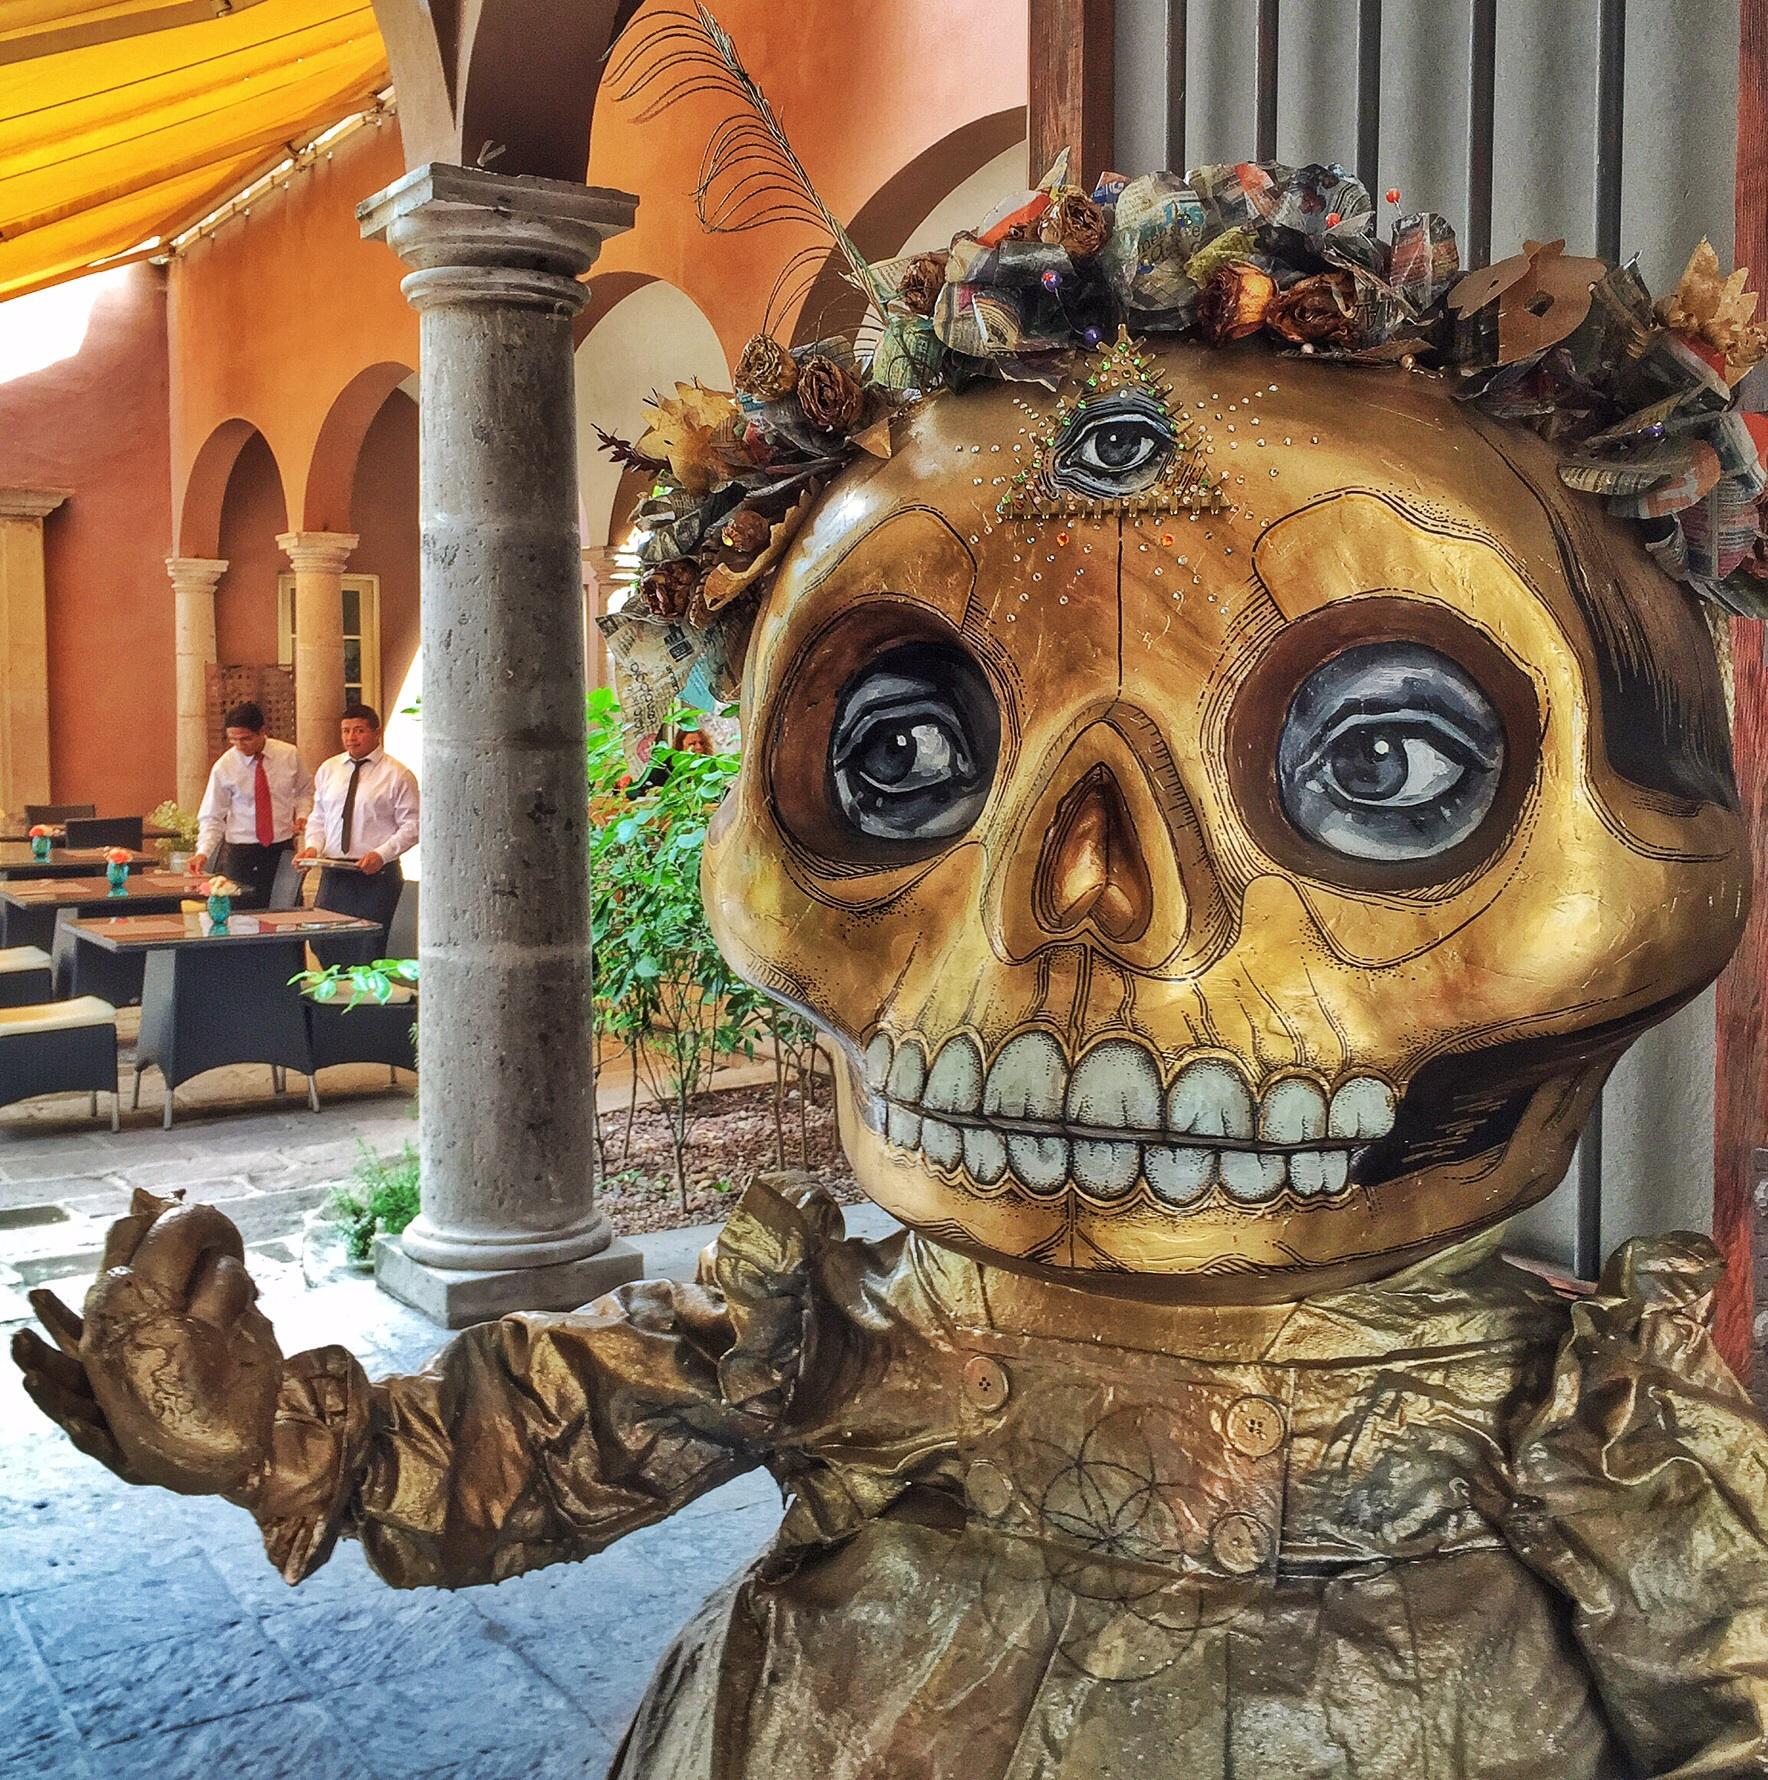 A restaurant in San Miguel de Allende, Mexico gets in the spirit for Nov. 1.